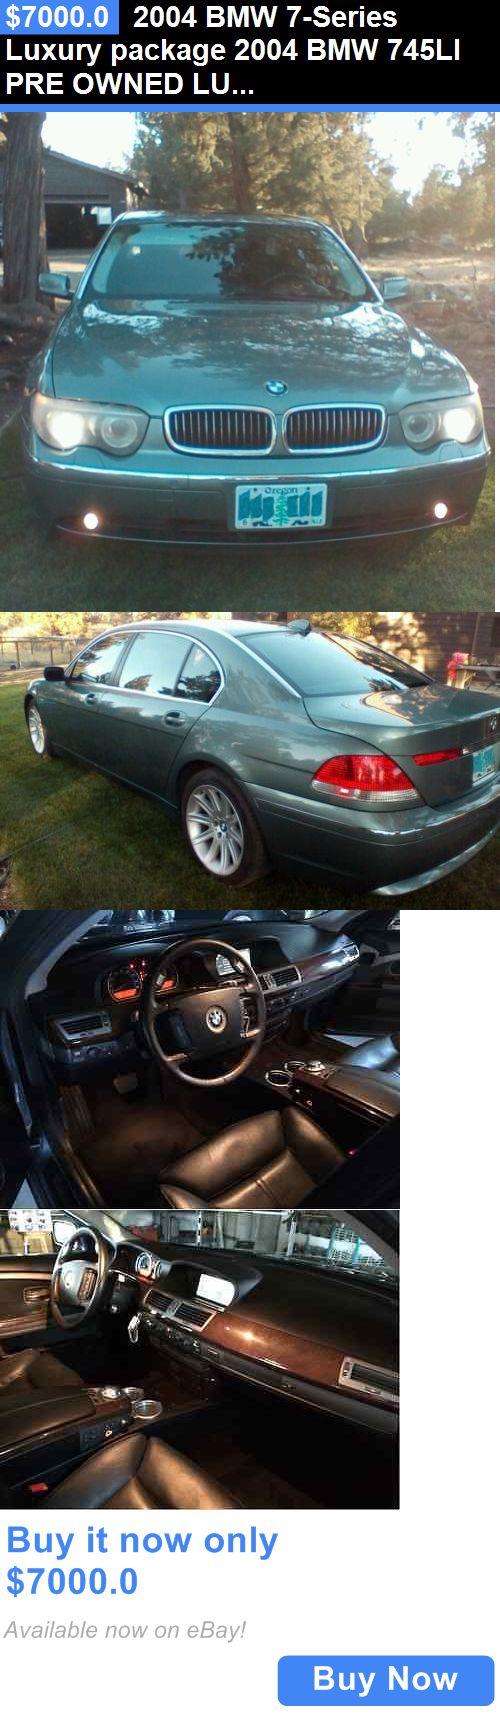 Luxury Cars: 2004 Bmw 7-Series Luxury Package 2004 Bmw 745Li Pre Owned Luxury Sedan, Nice Car, Service Contract, True Bargain BUY IT NOW ONLY: $7000.0